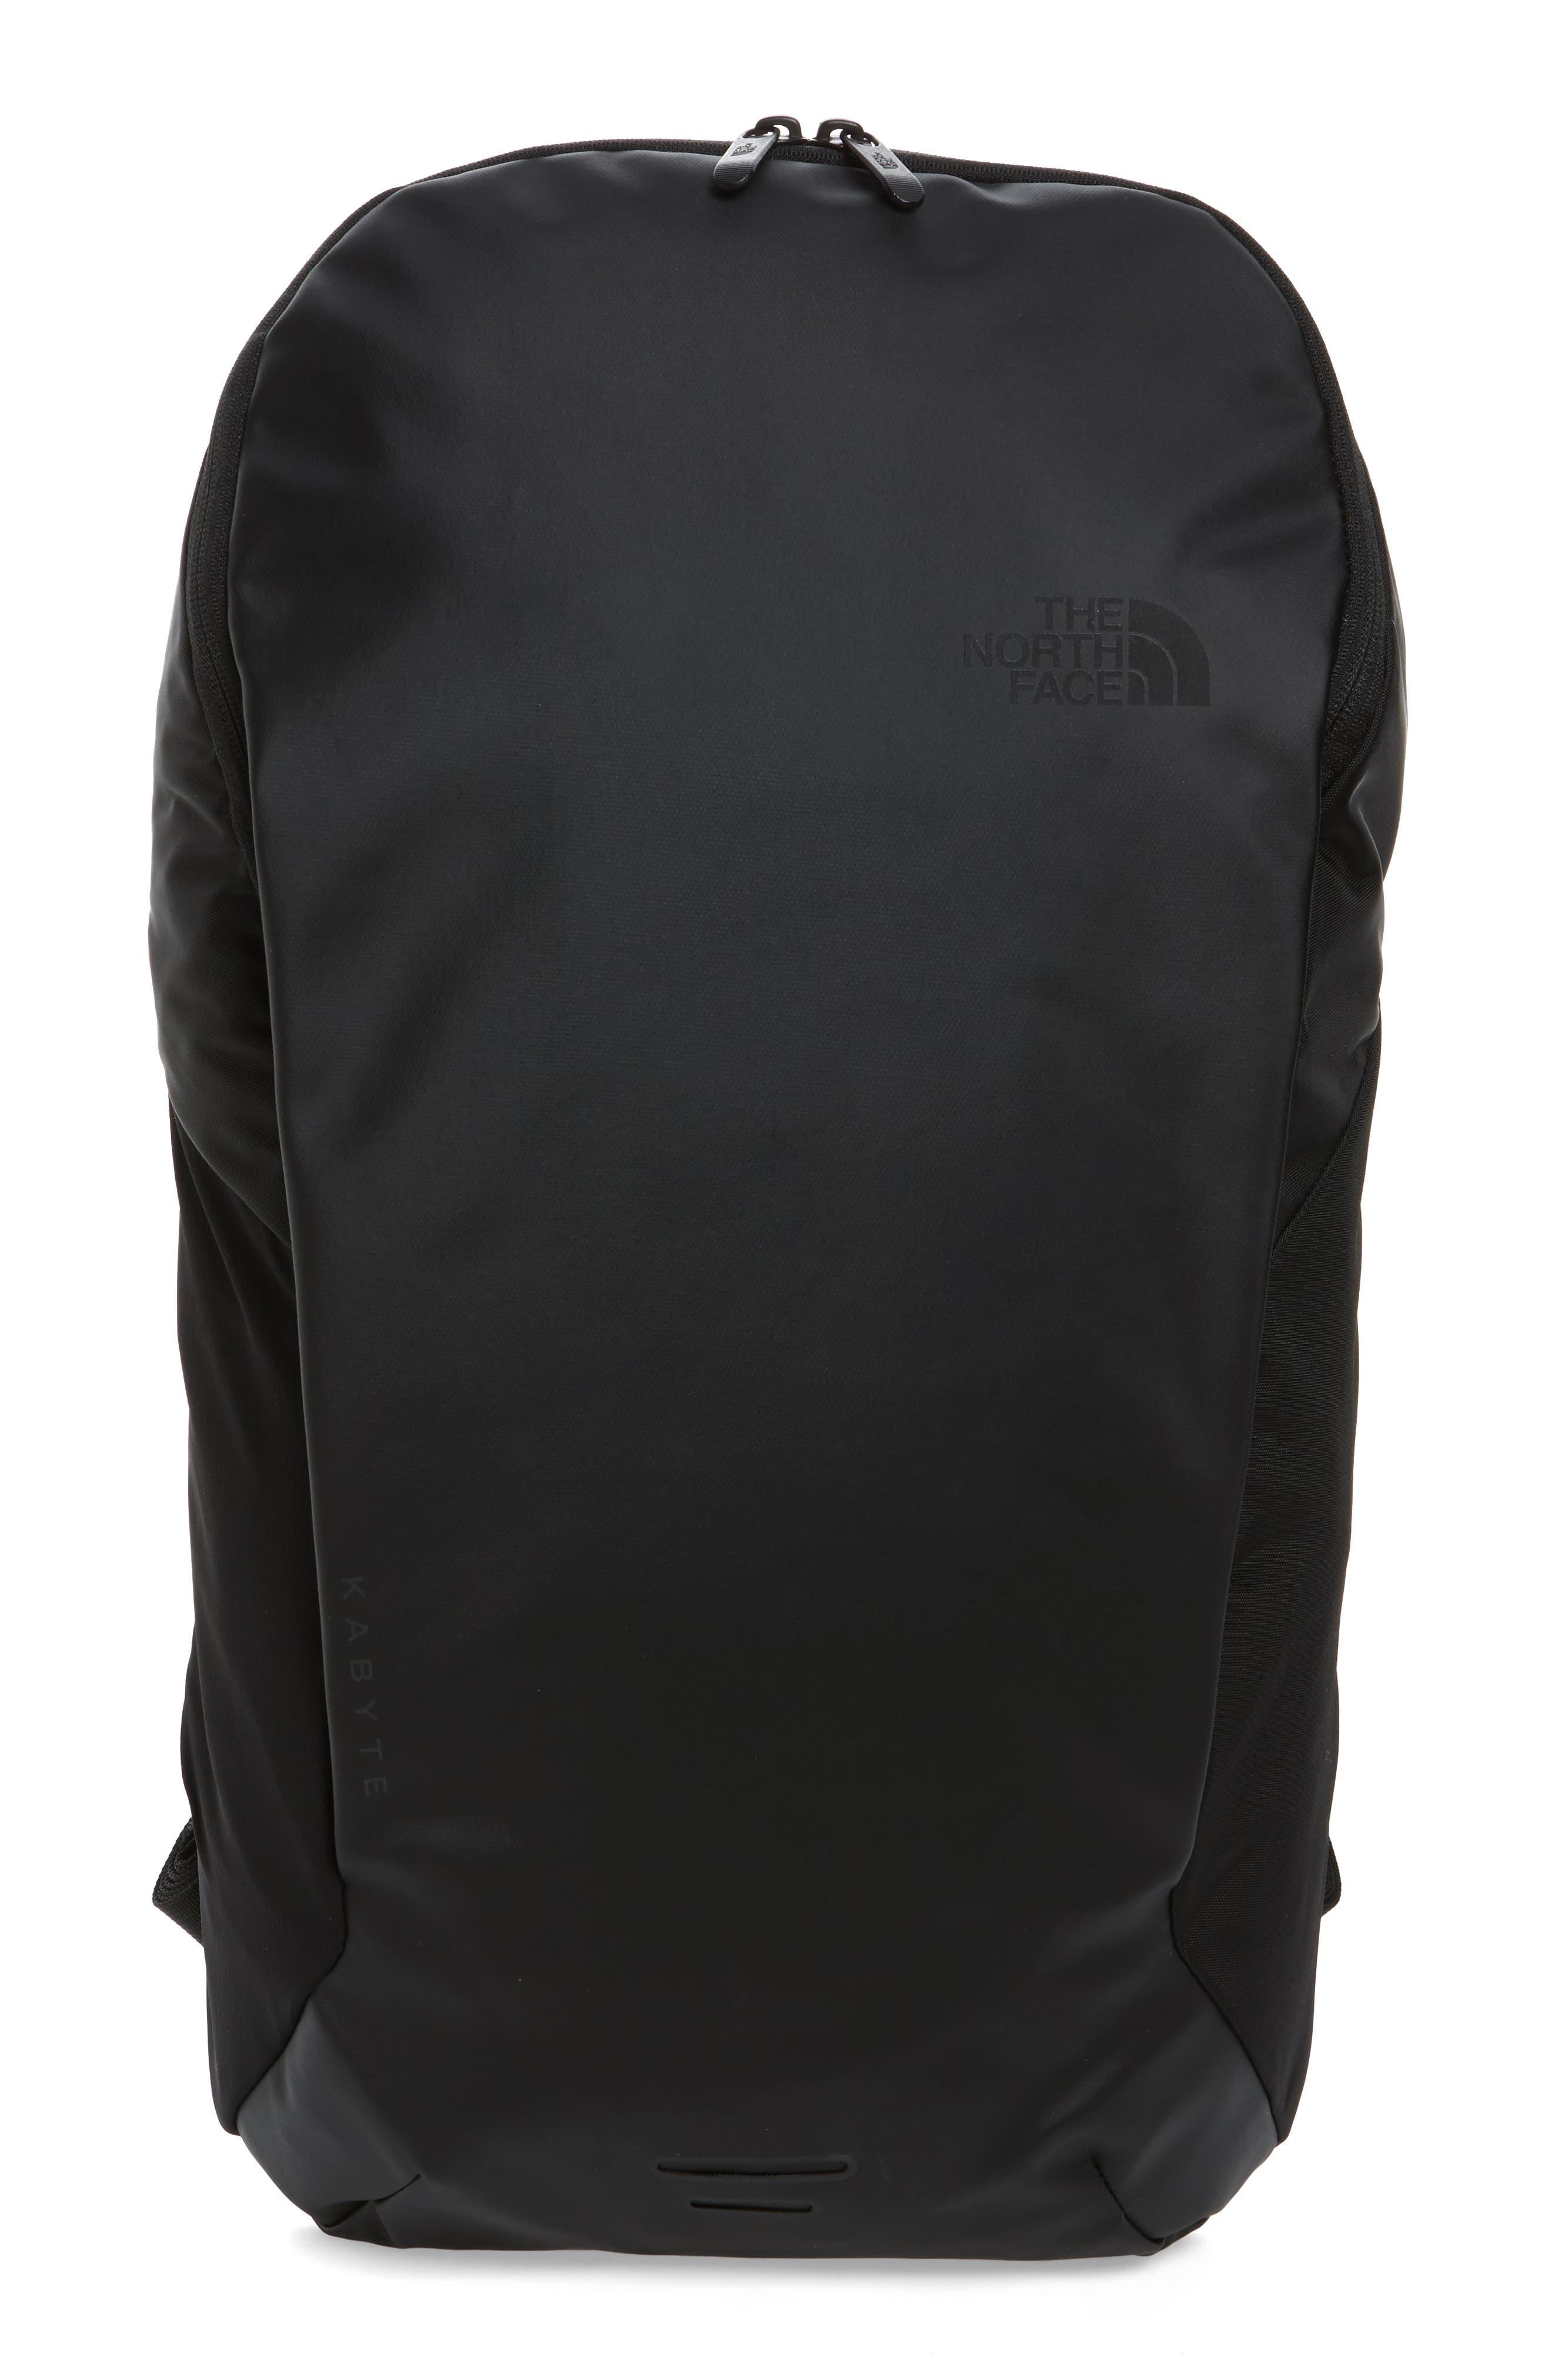 Main Image - The North Face Kabyte Backpack